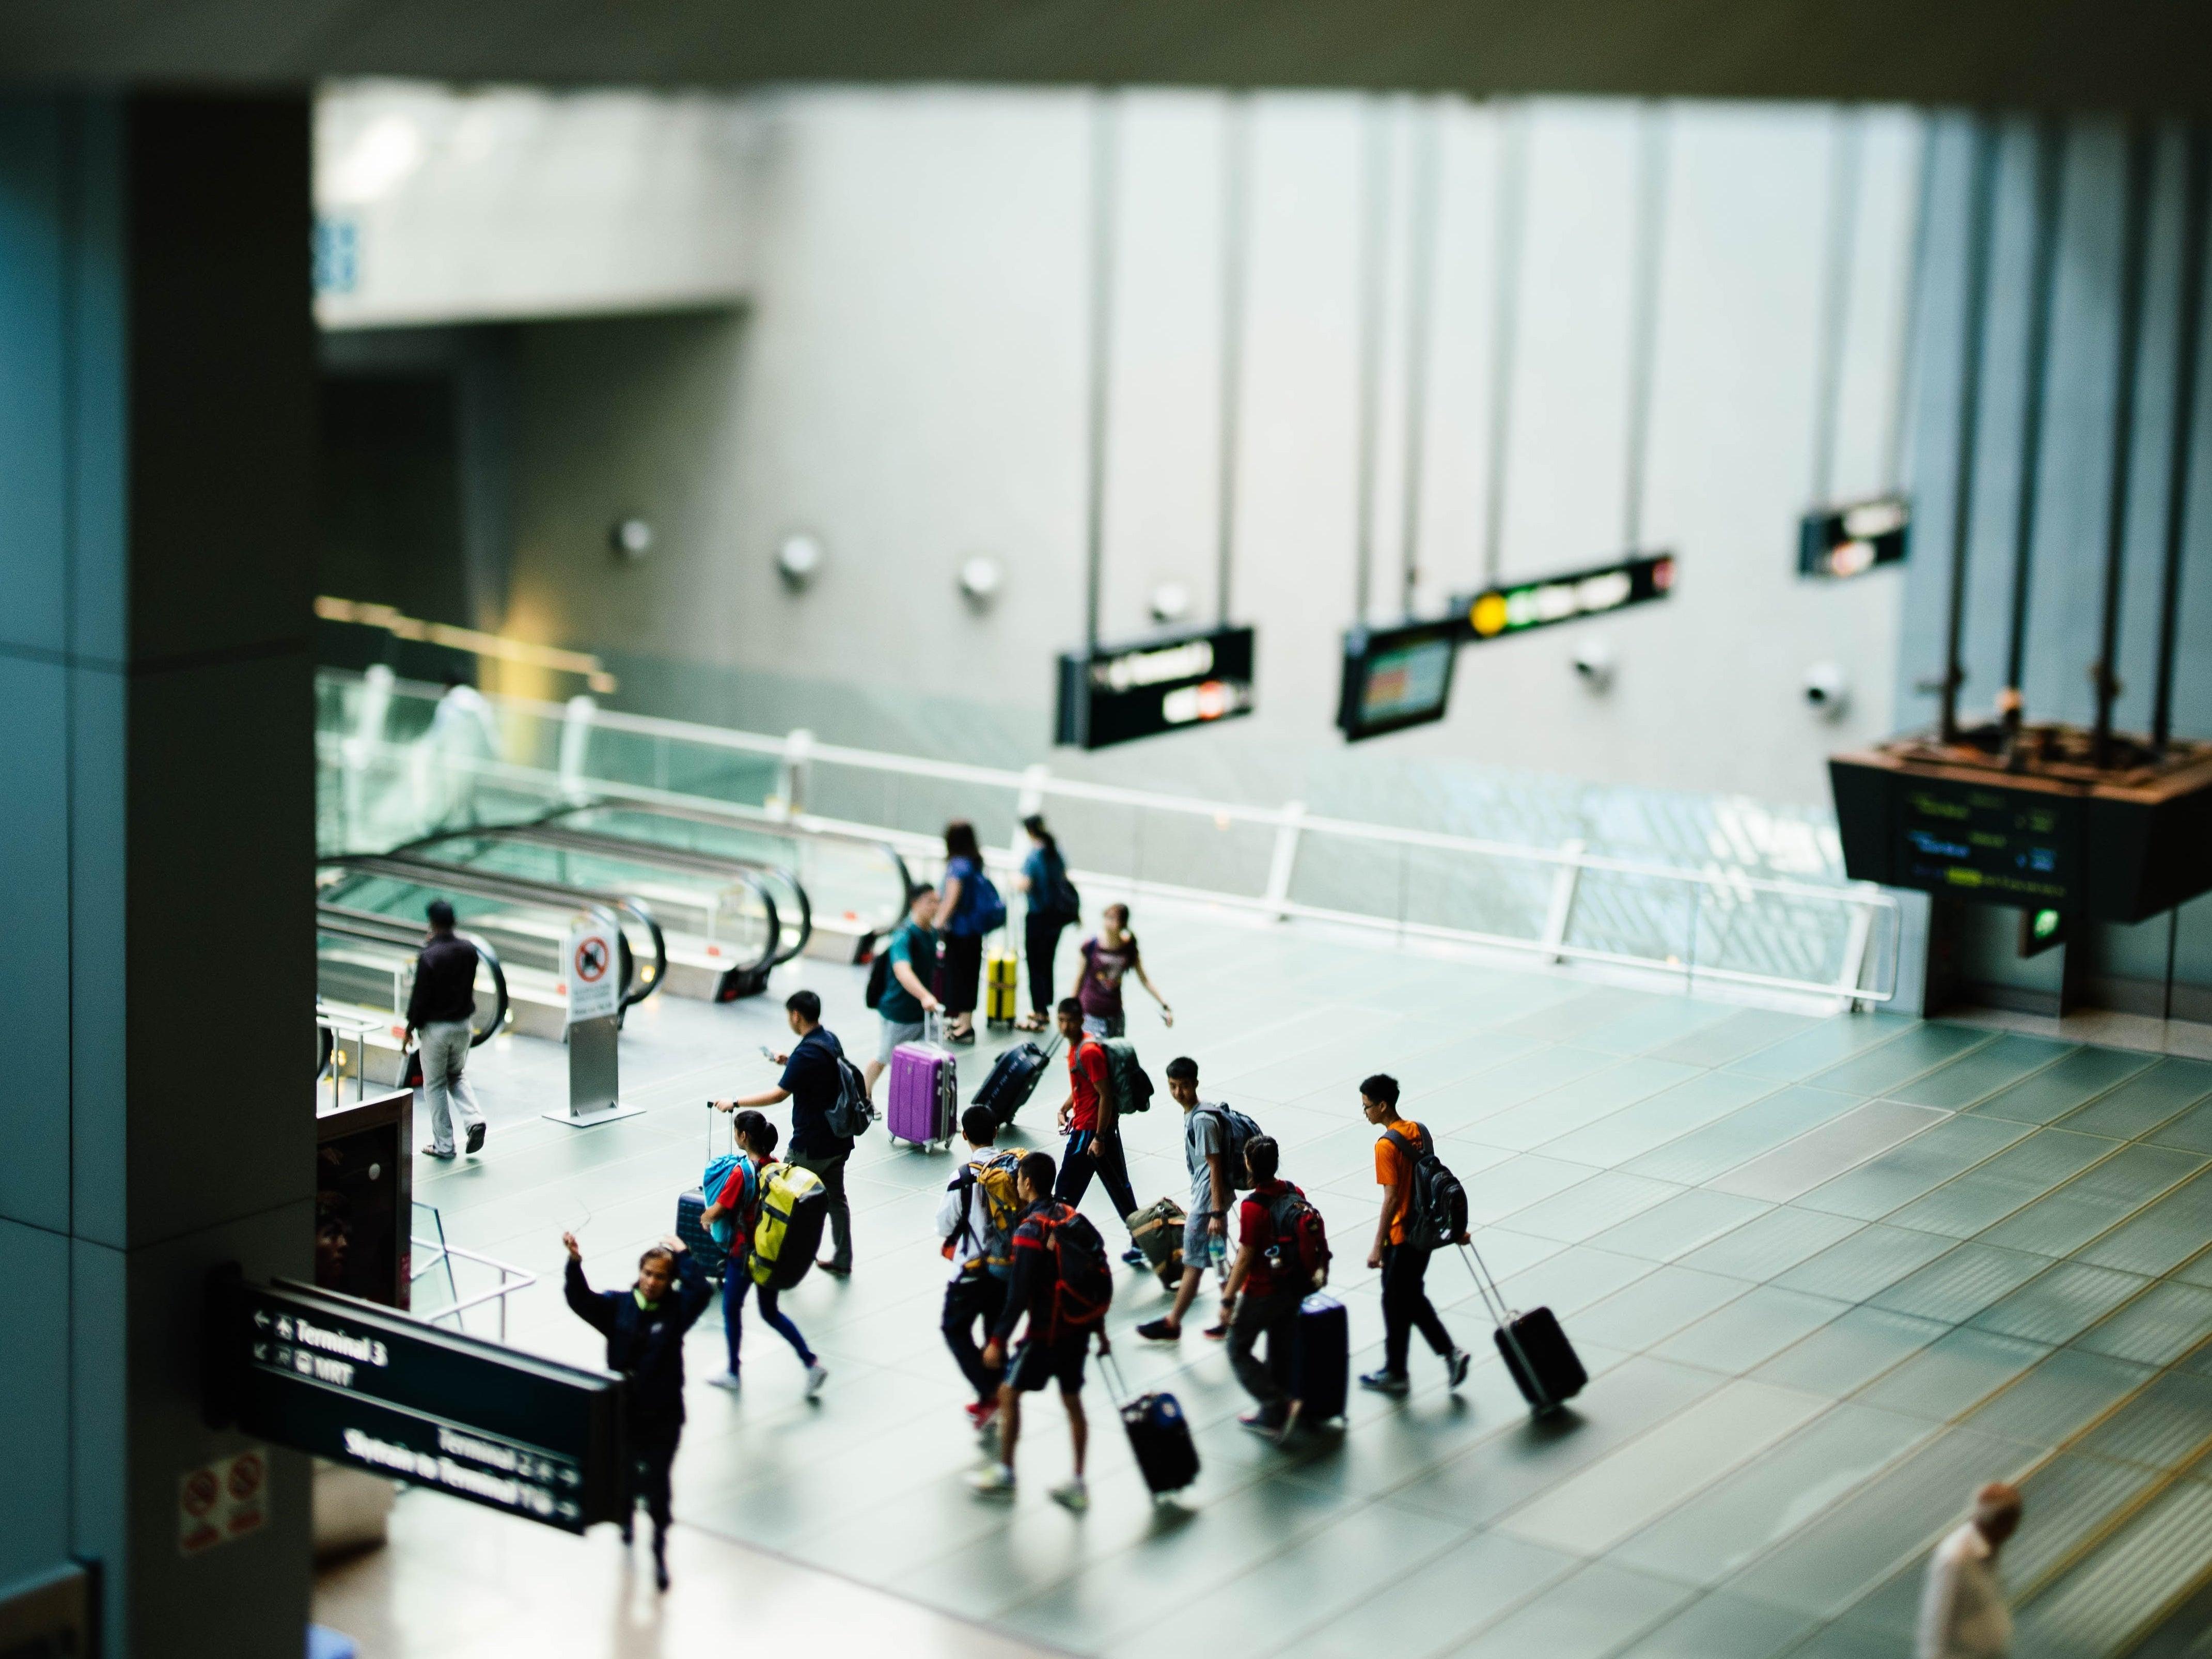 Coronavirus outbreak: A warning for overseas travellers